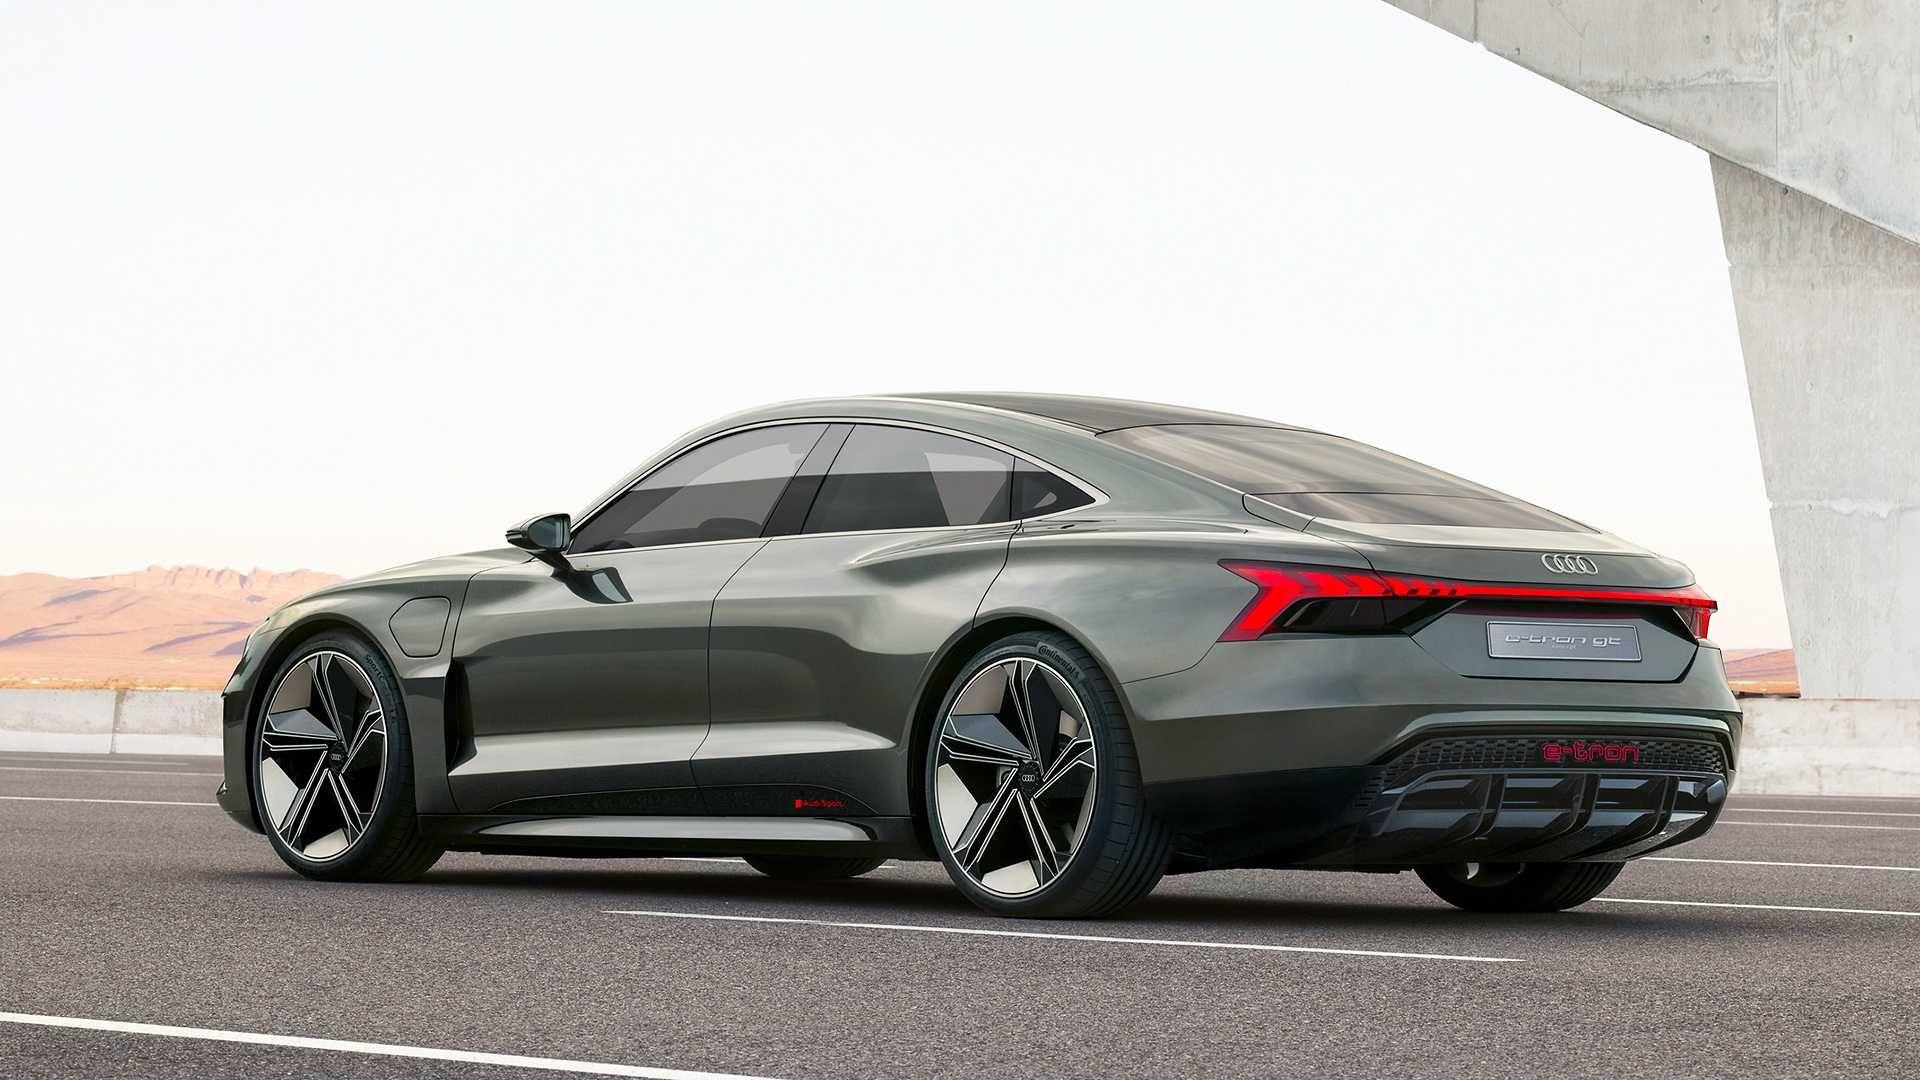 New Audi E Tron Gt Concept Audi E Tron Audi Tesla Model S